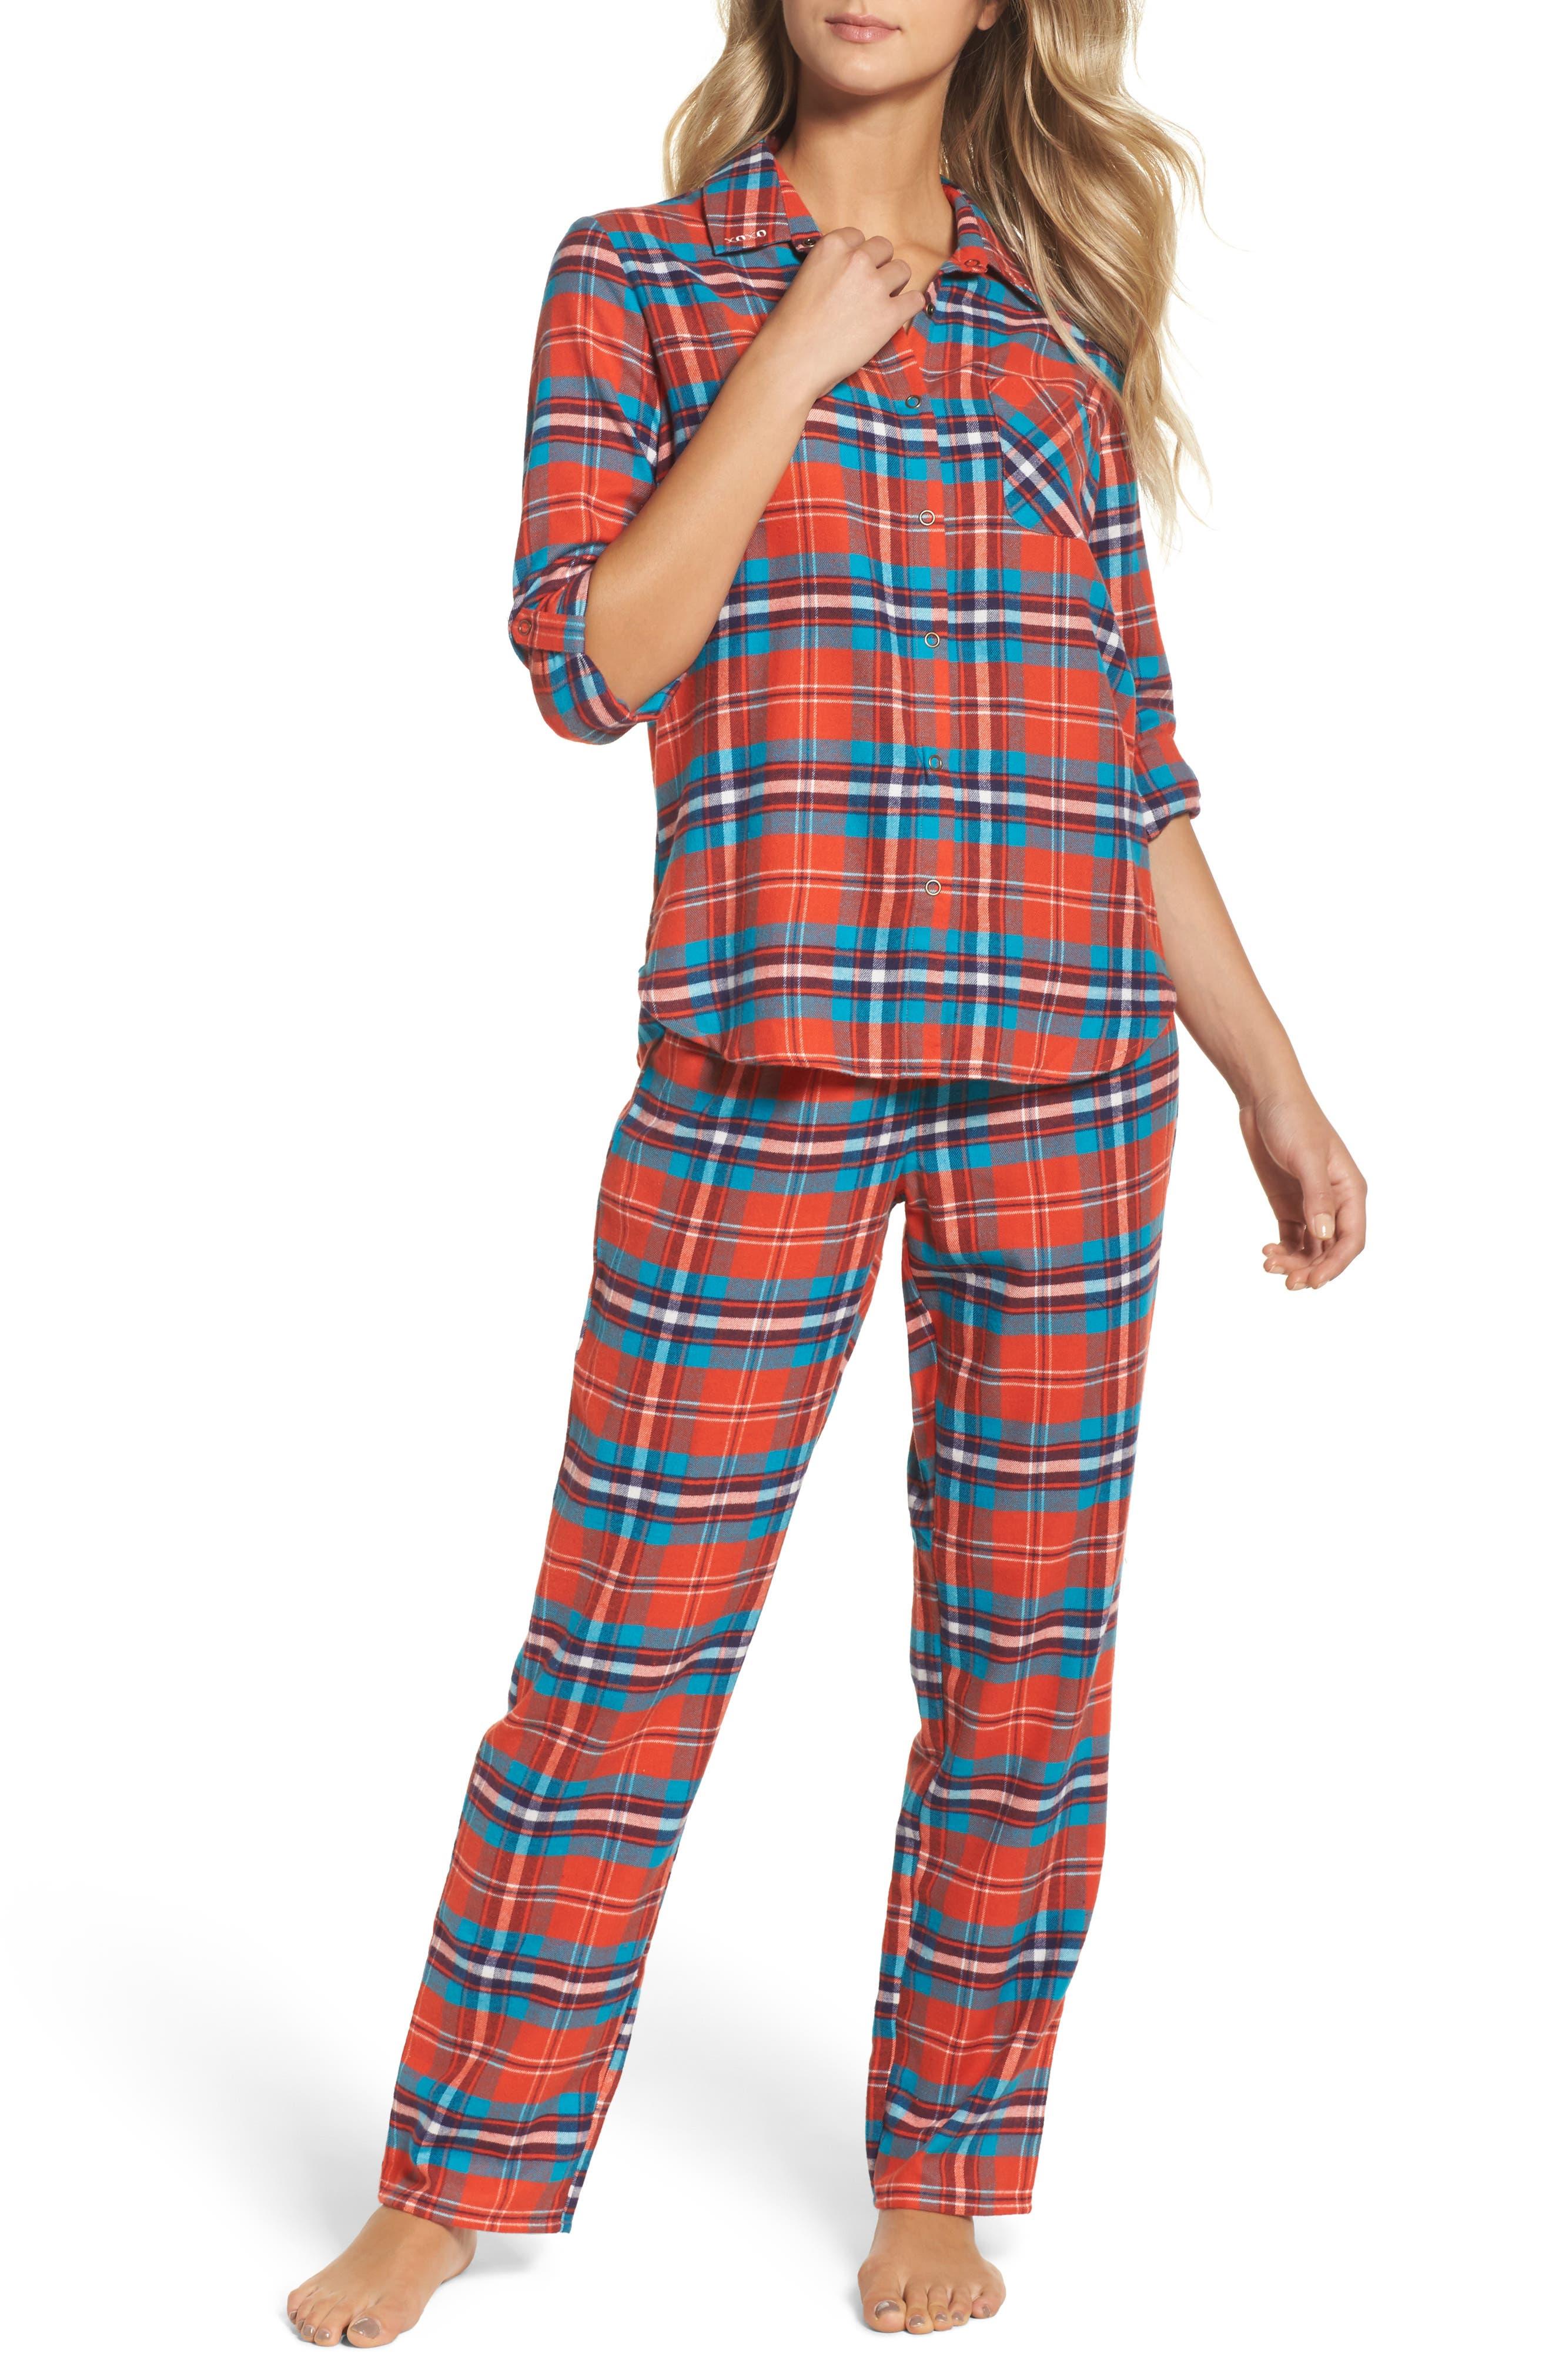 Alternate Image 1 Selected - Make + Model Flannel Girlfriend Pajamas